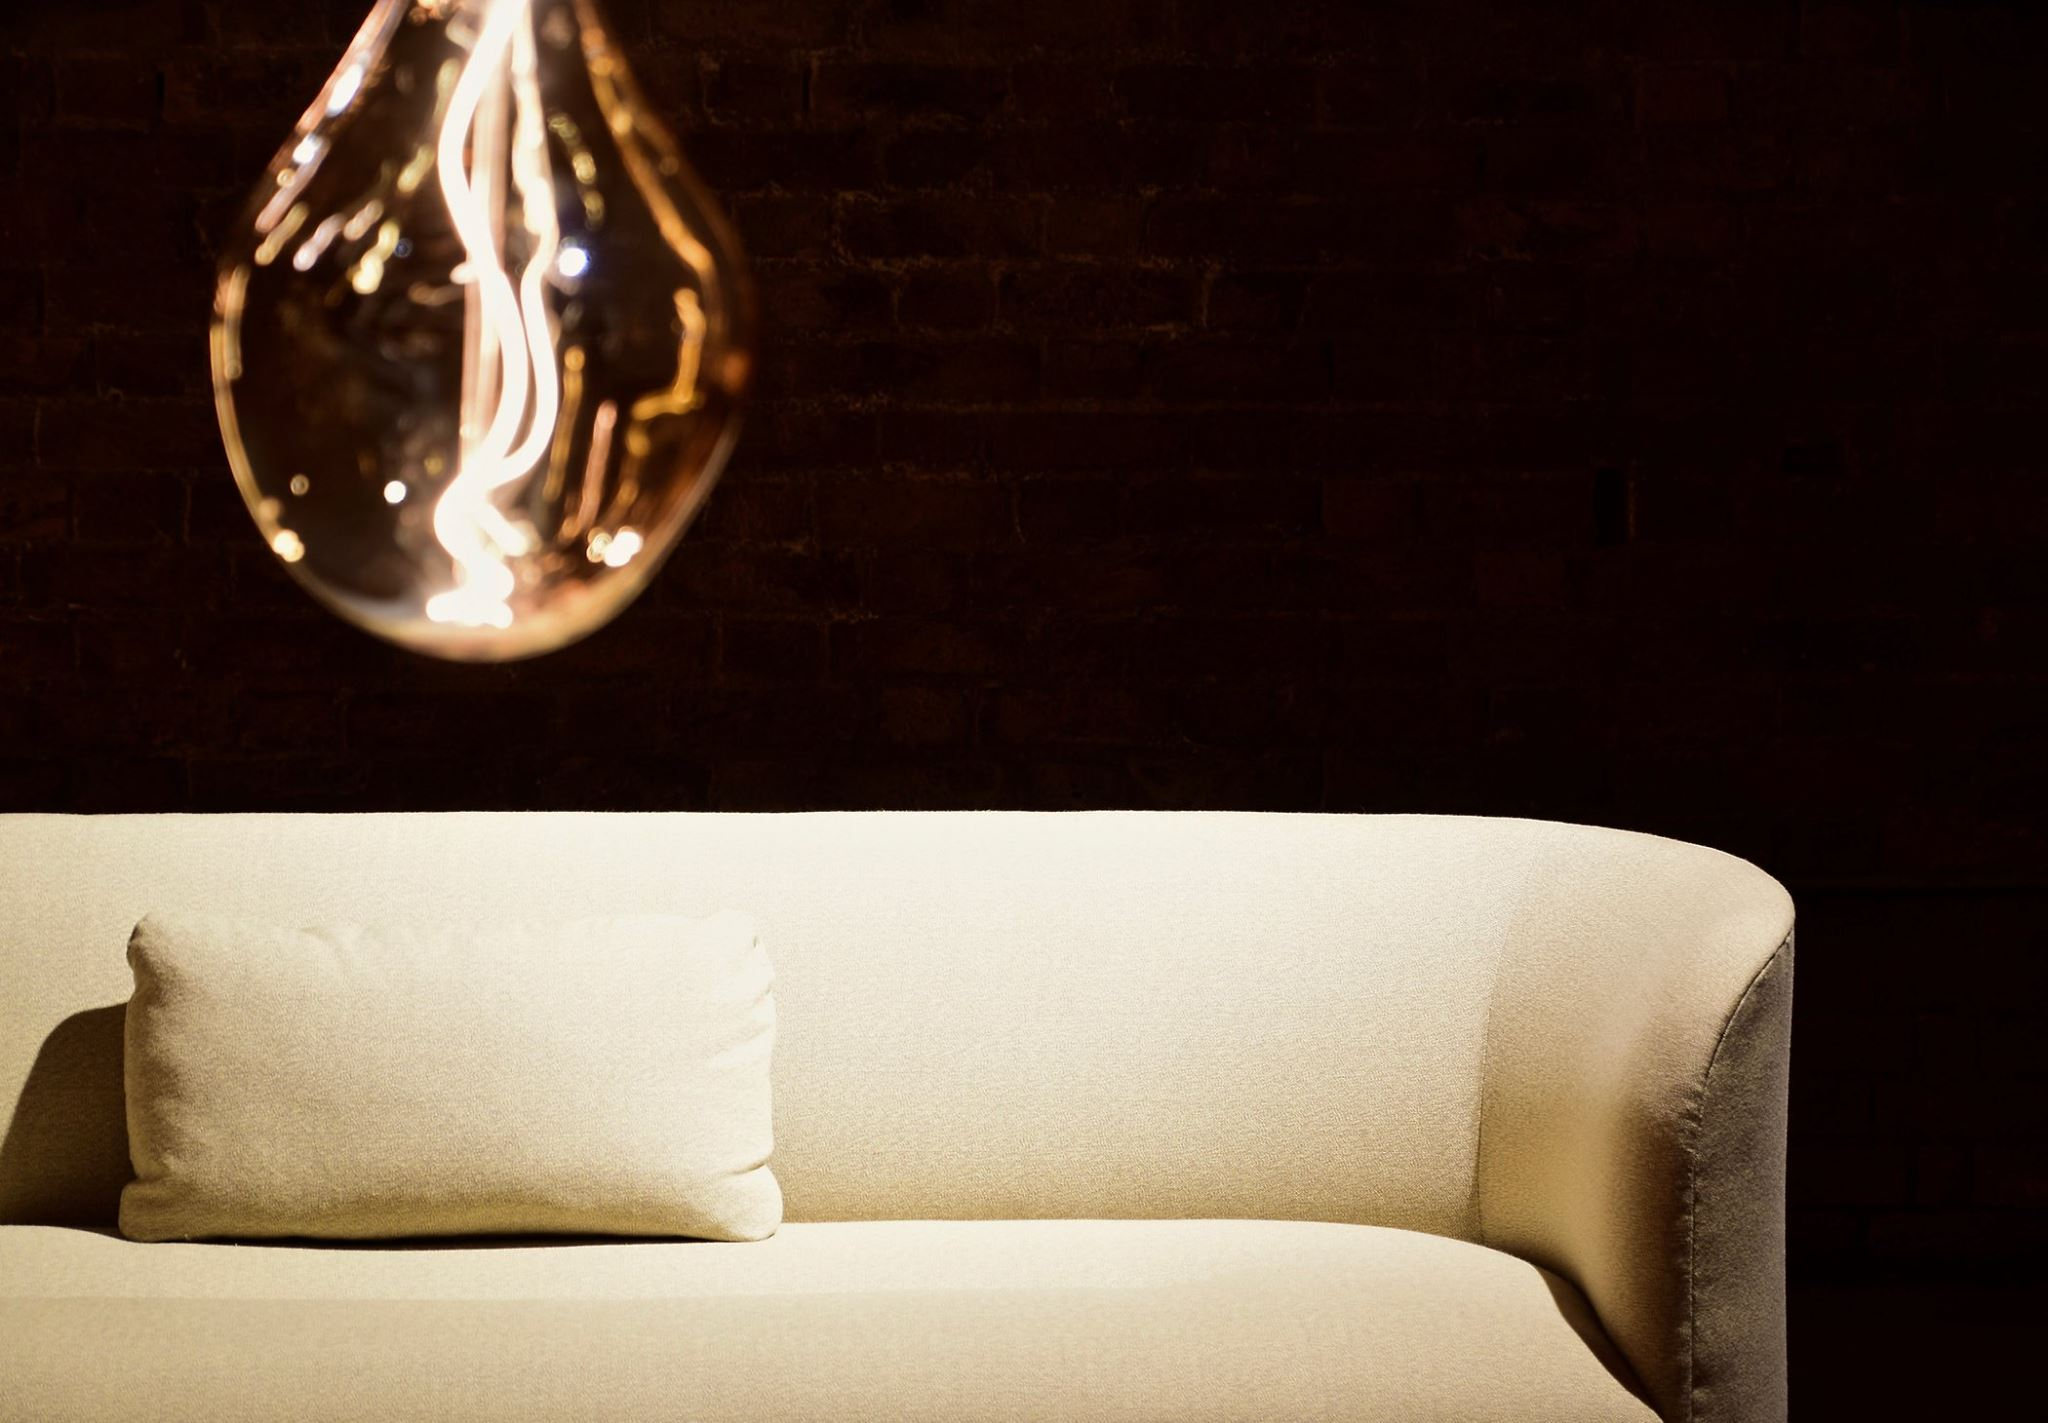 lighting-control-Lutron